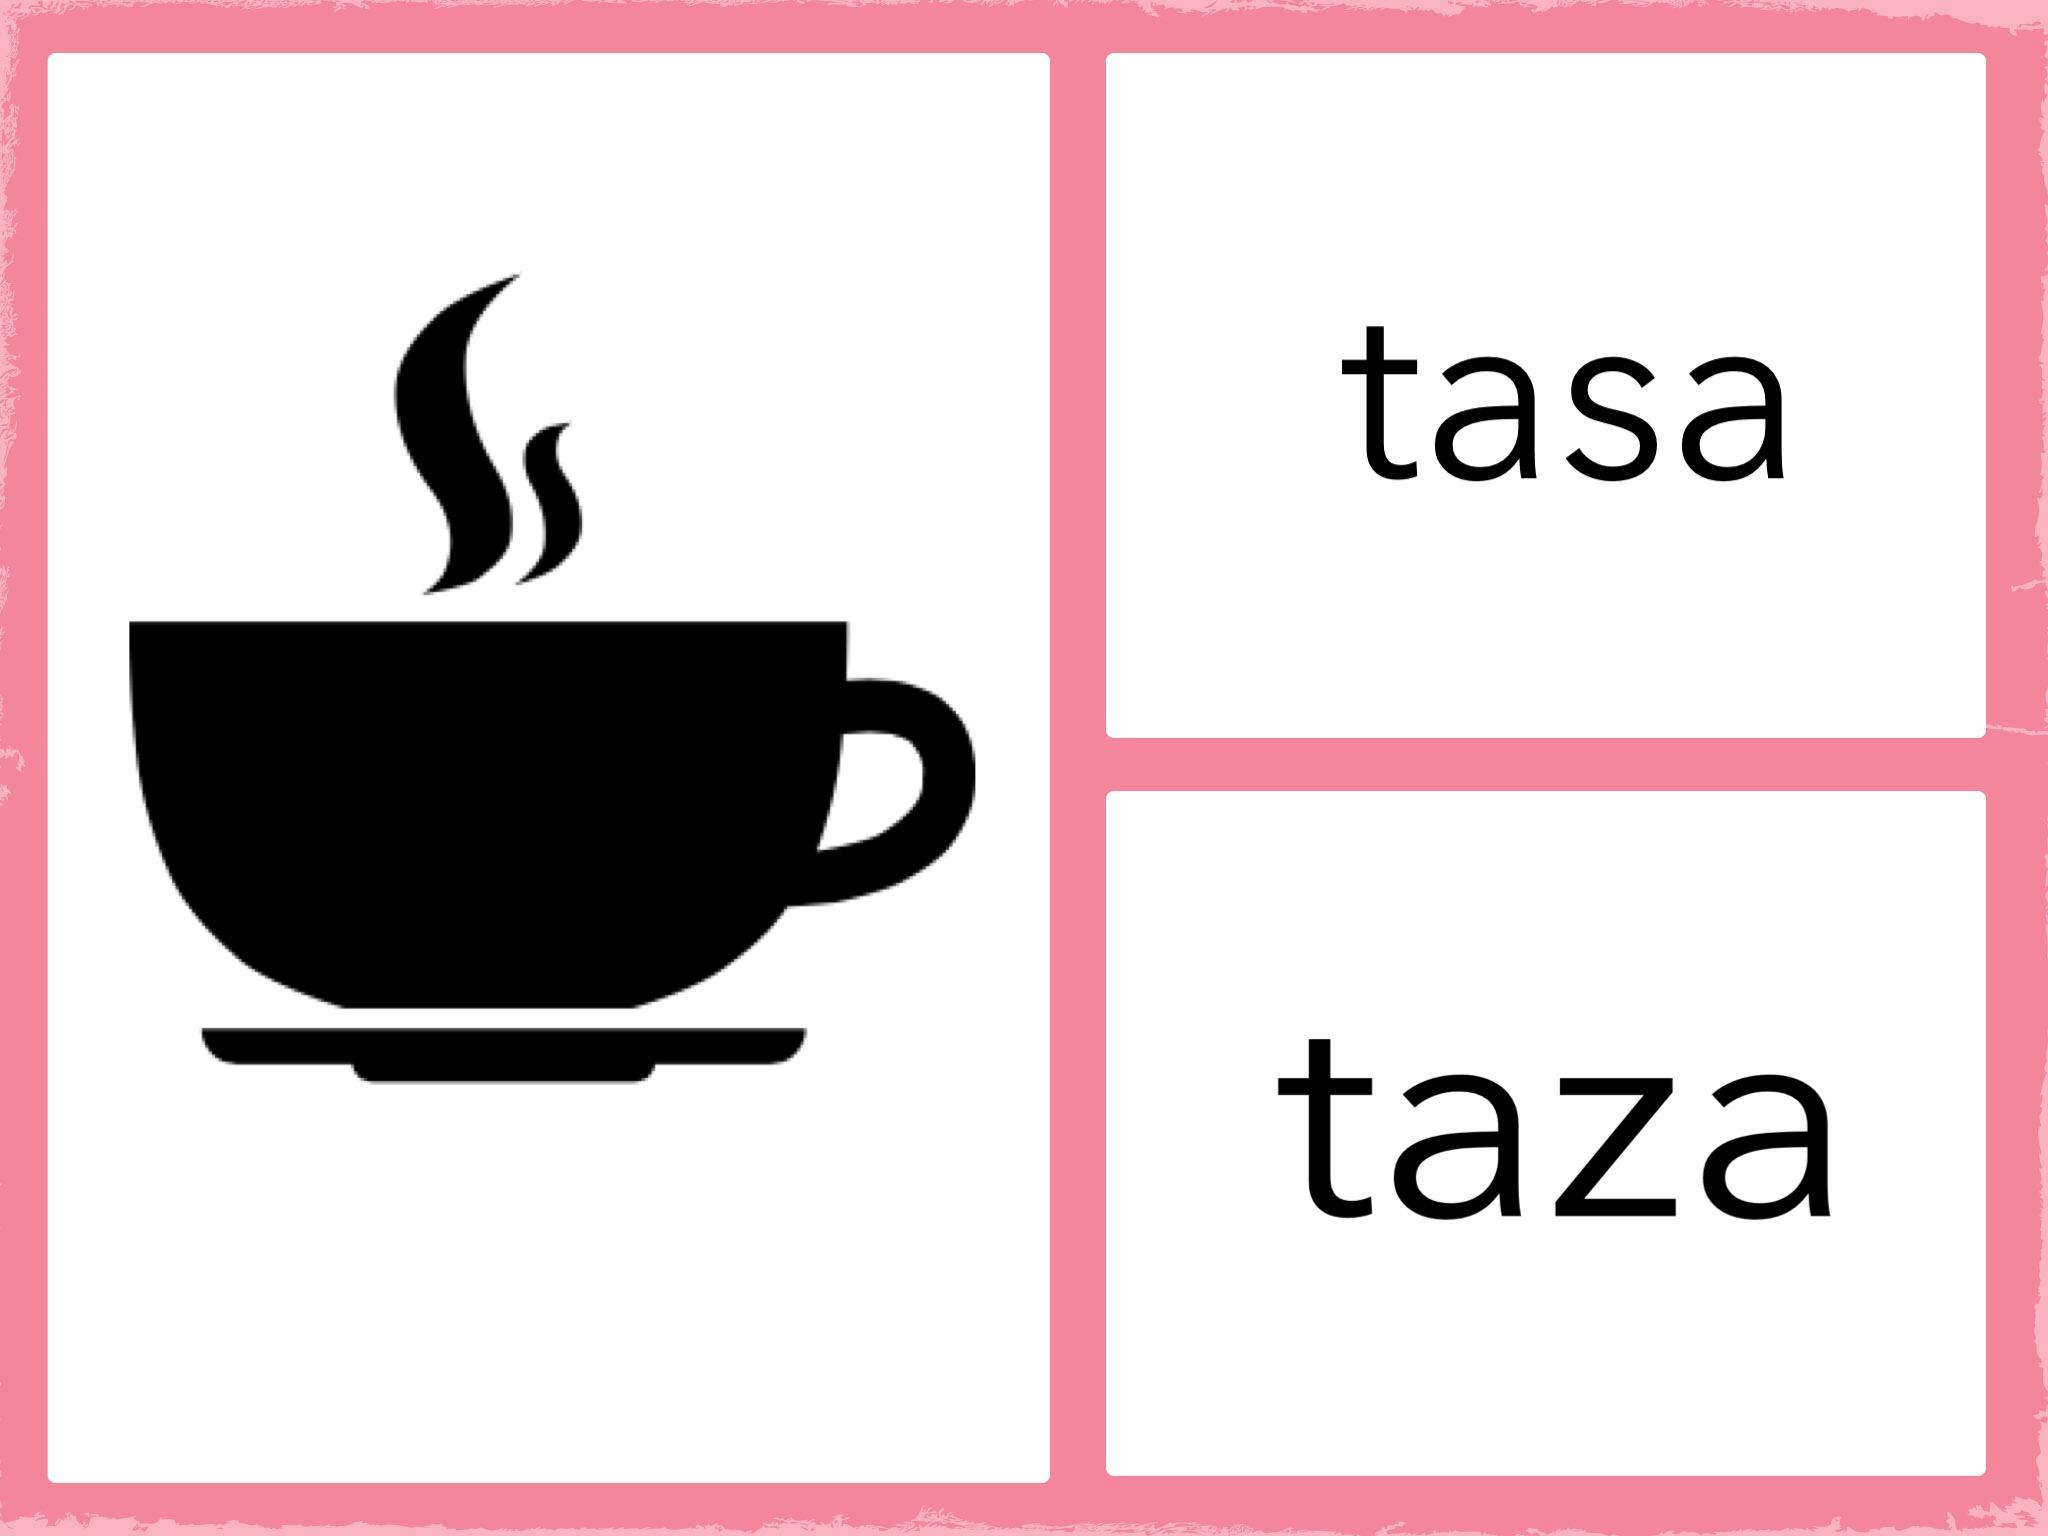 PARES SIMILARES: tasa vs. taza